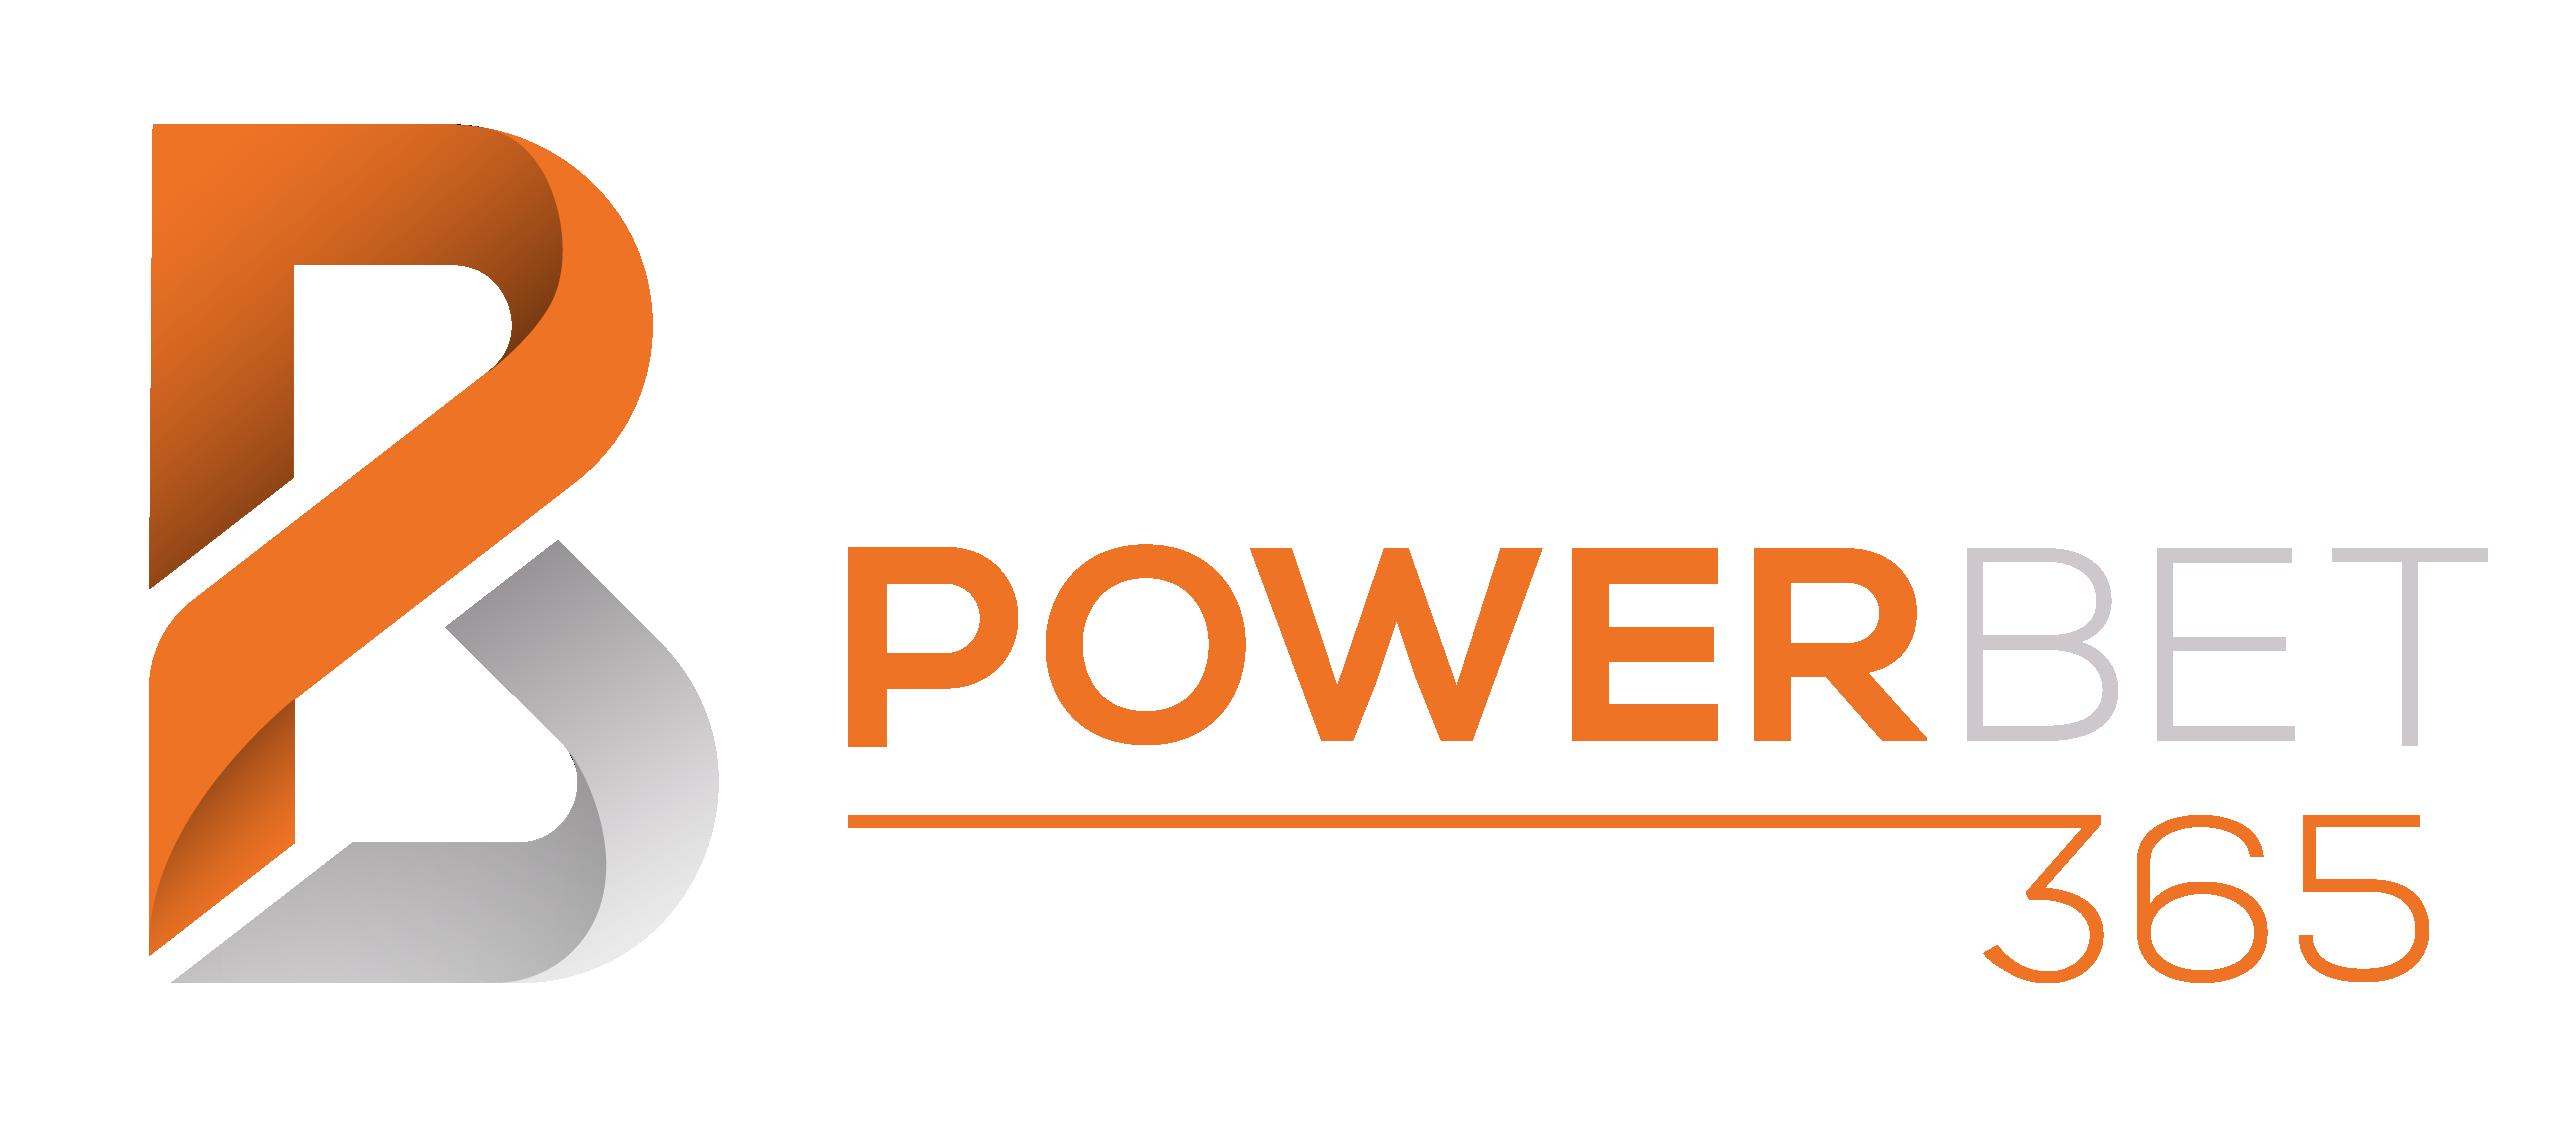 Powerbet365.com แทงบอล คาสิโนออนไลน์